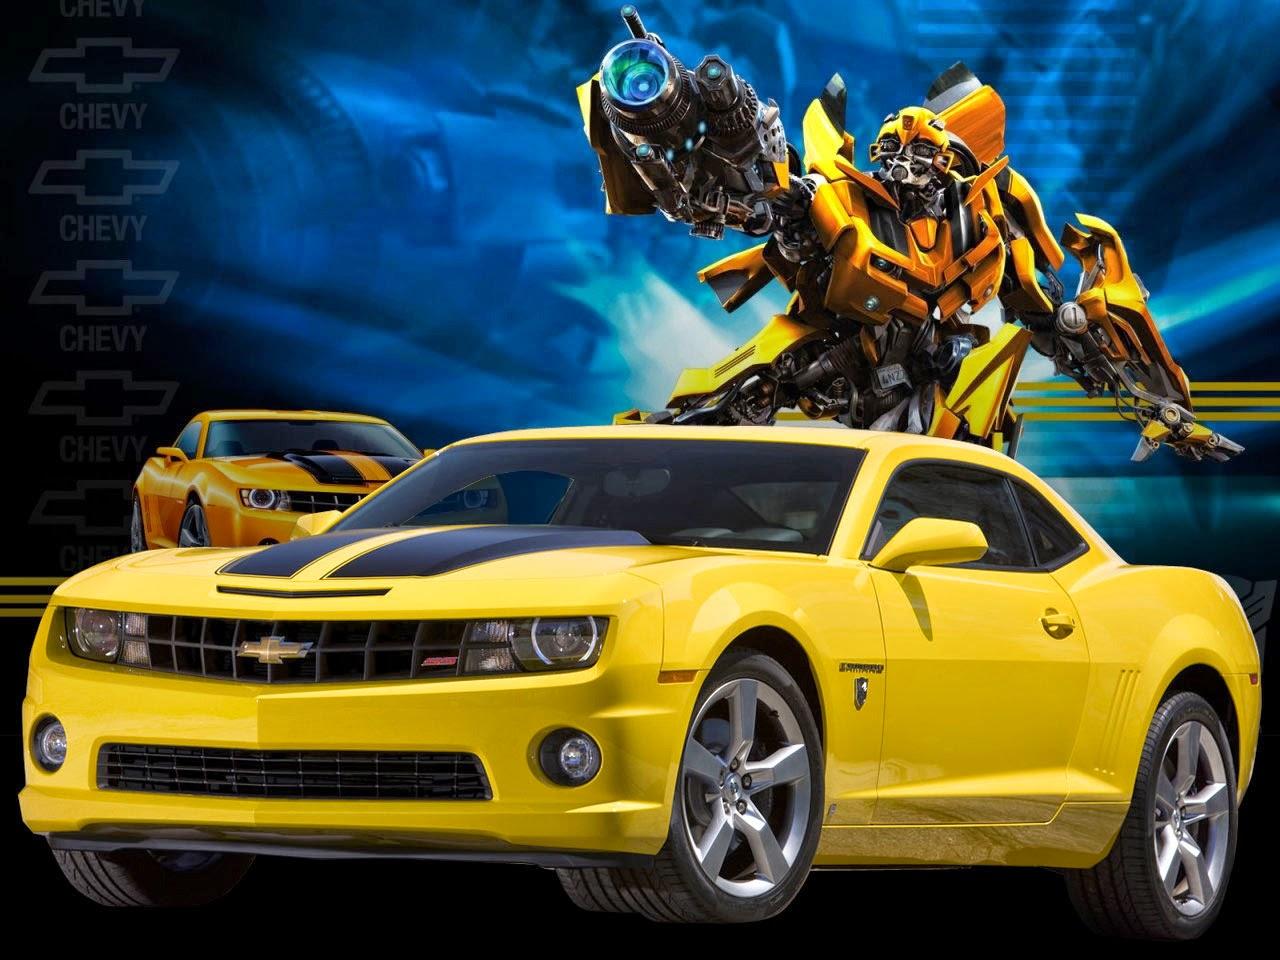 2014-chevy-camaro-bumblebee-1